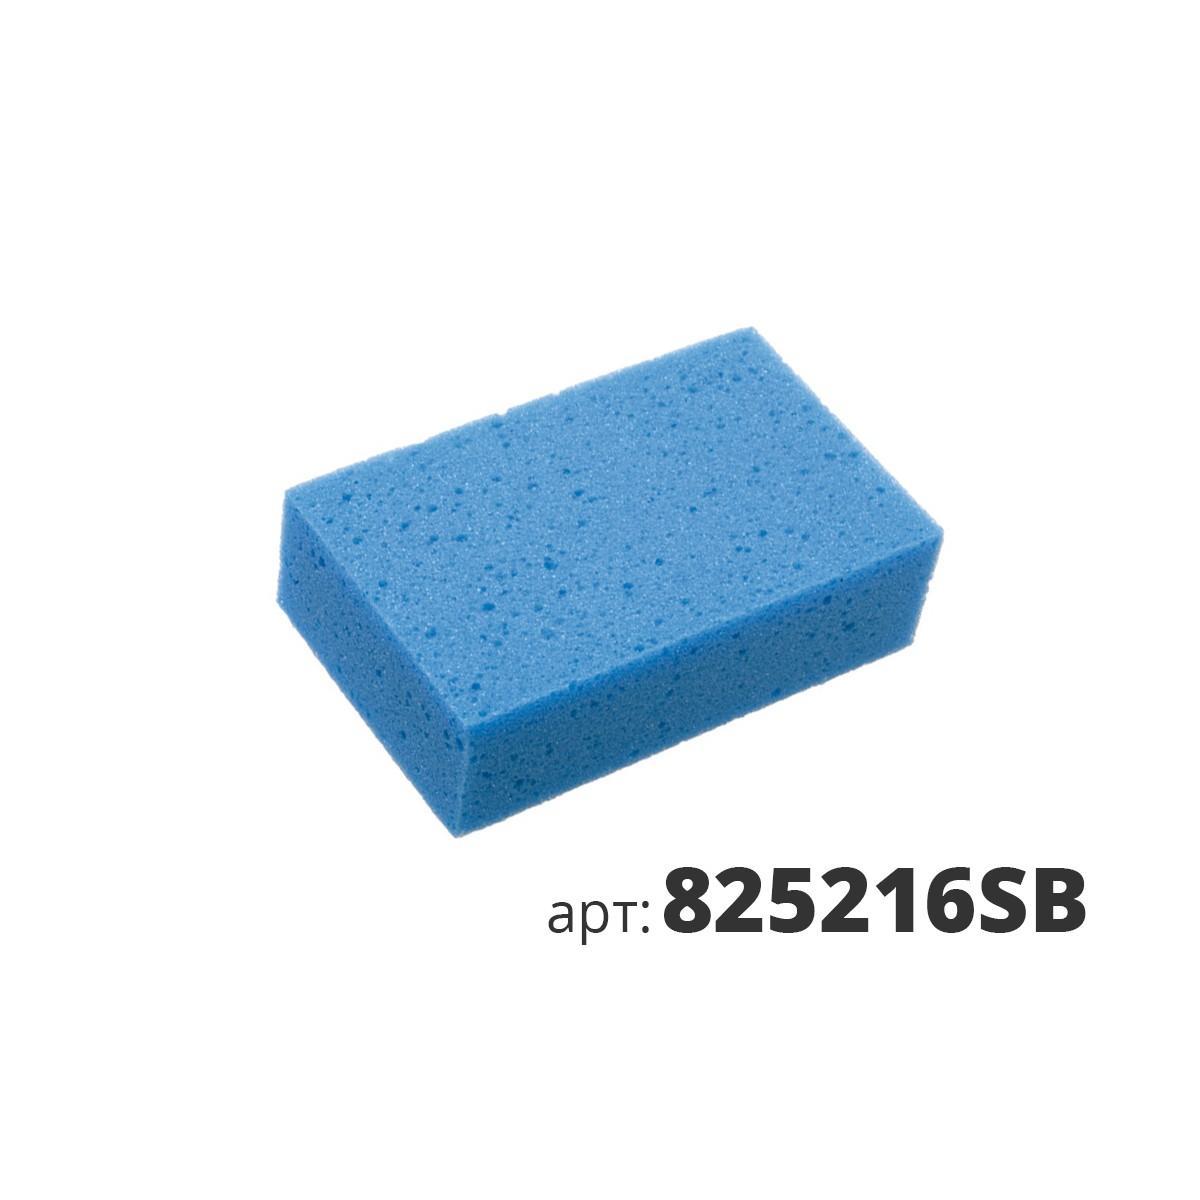 МАКО губка - синяя, мелкопористая губка, полиэстер 825216SB